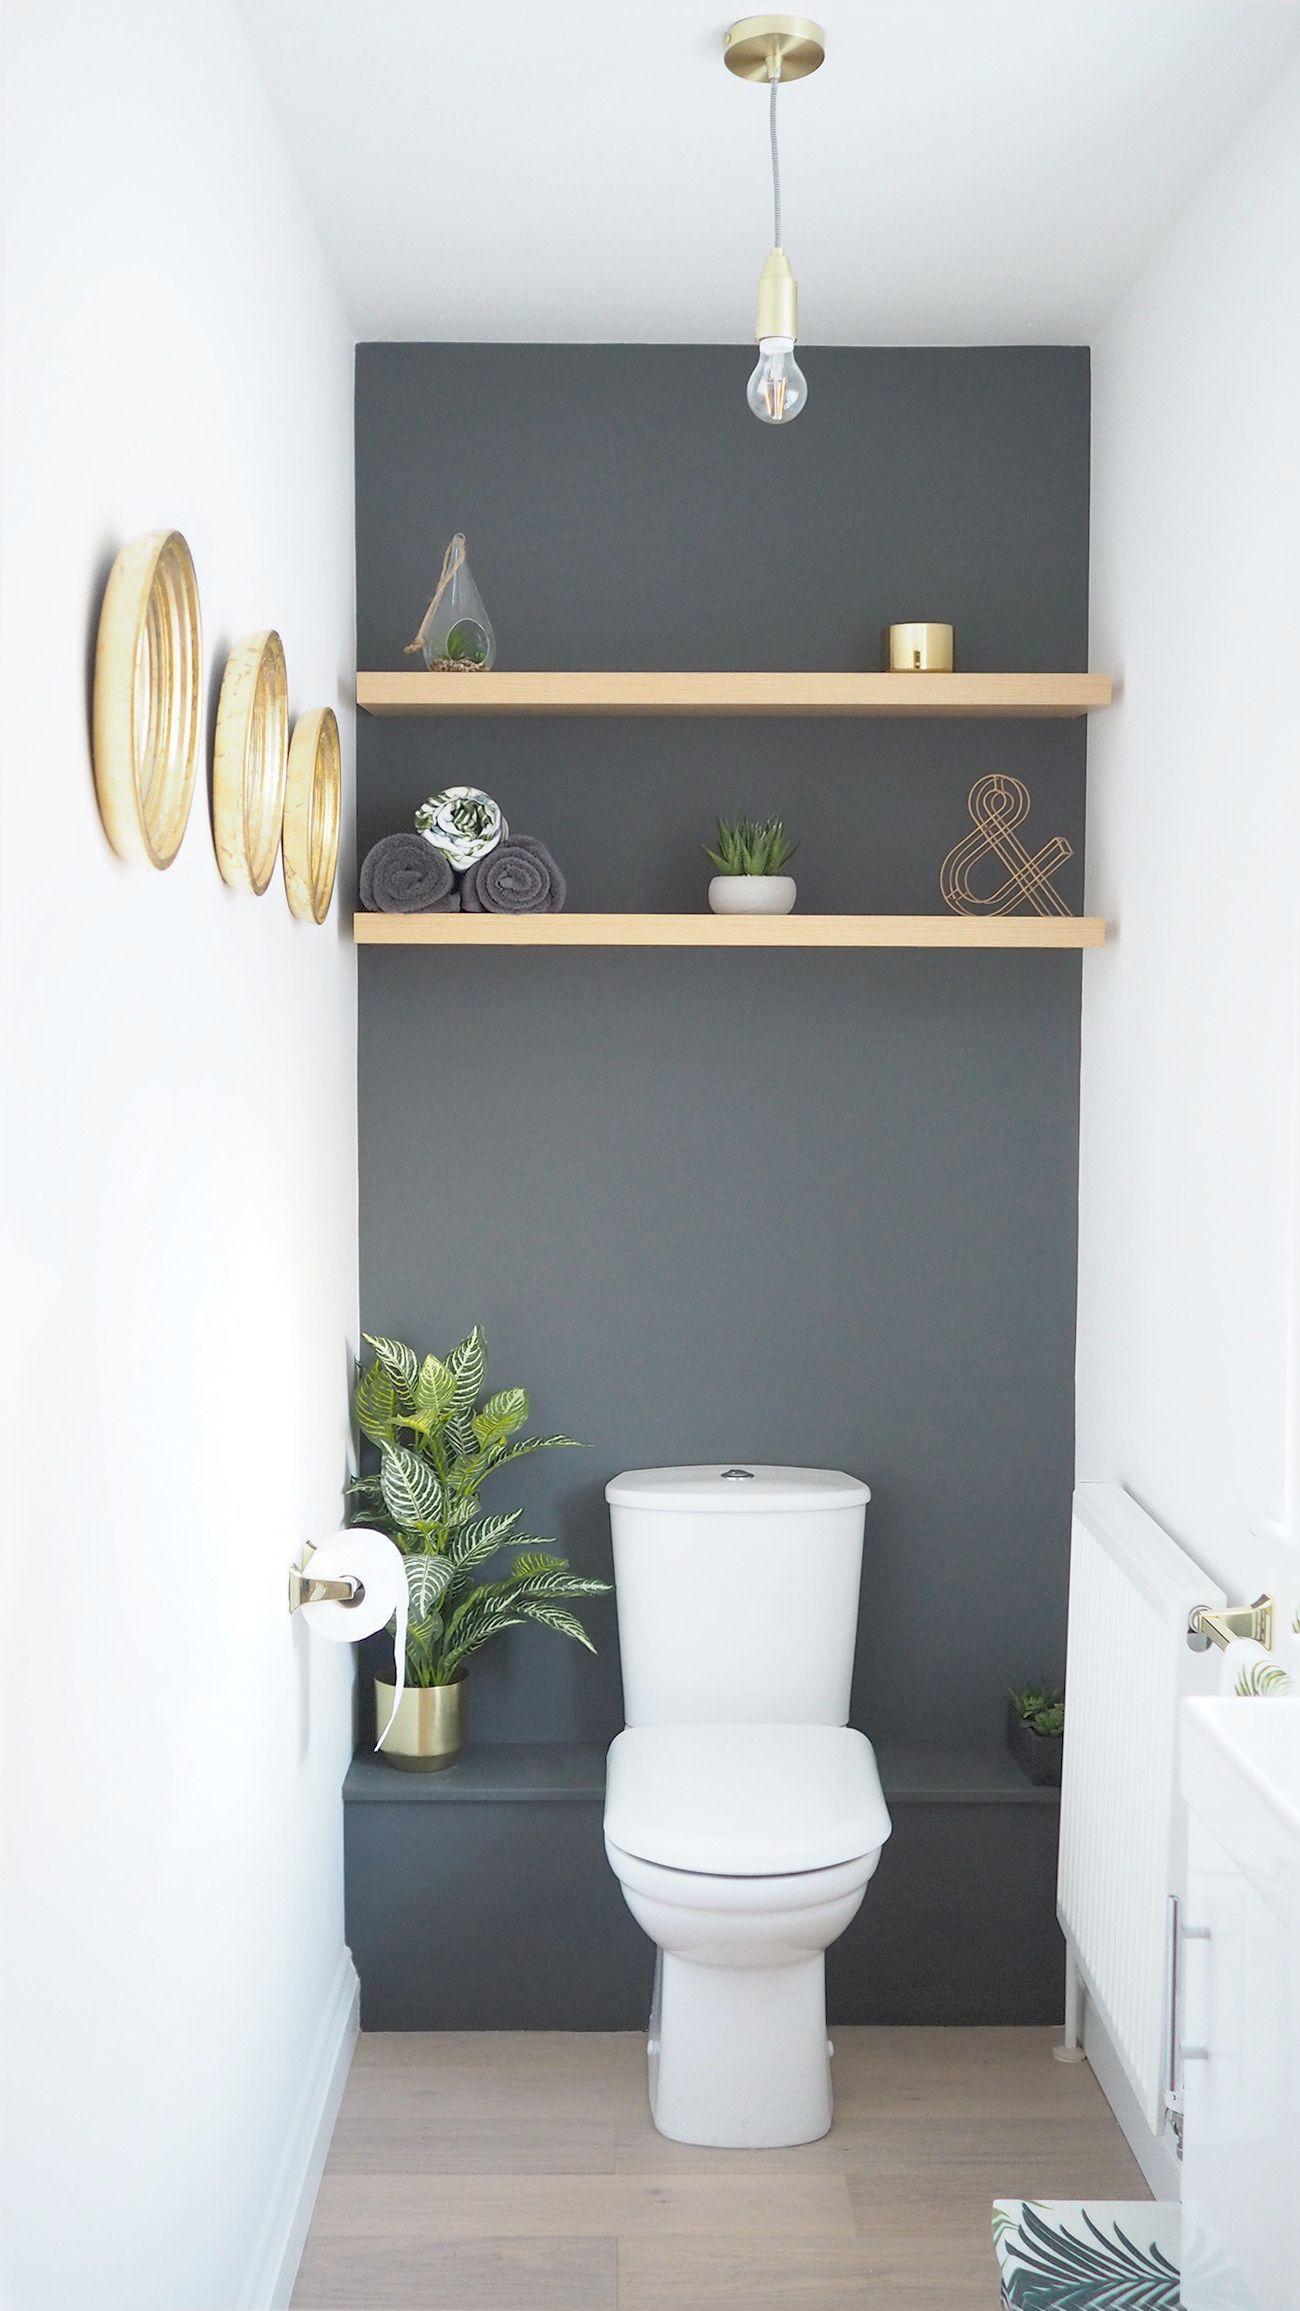 Bathroom Decor Diy Ideas Bathroom Ideas In Grey Bathroom Light Fixtures On Amazon Until Bathroom Ideas No Tu Downstairs Toilet Bathroom Decor Toilet Closet